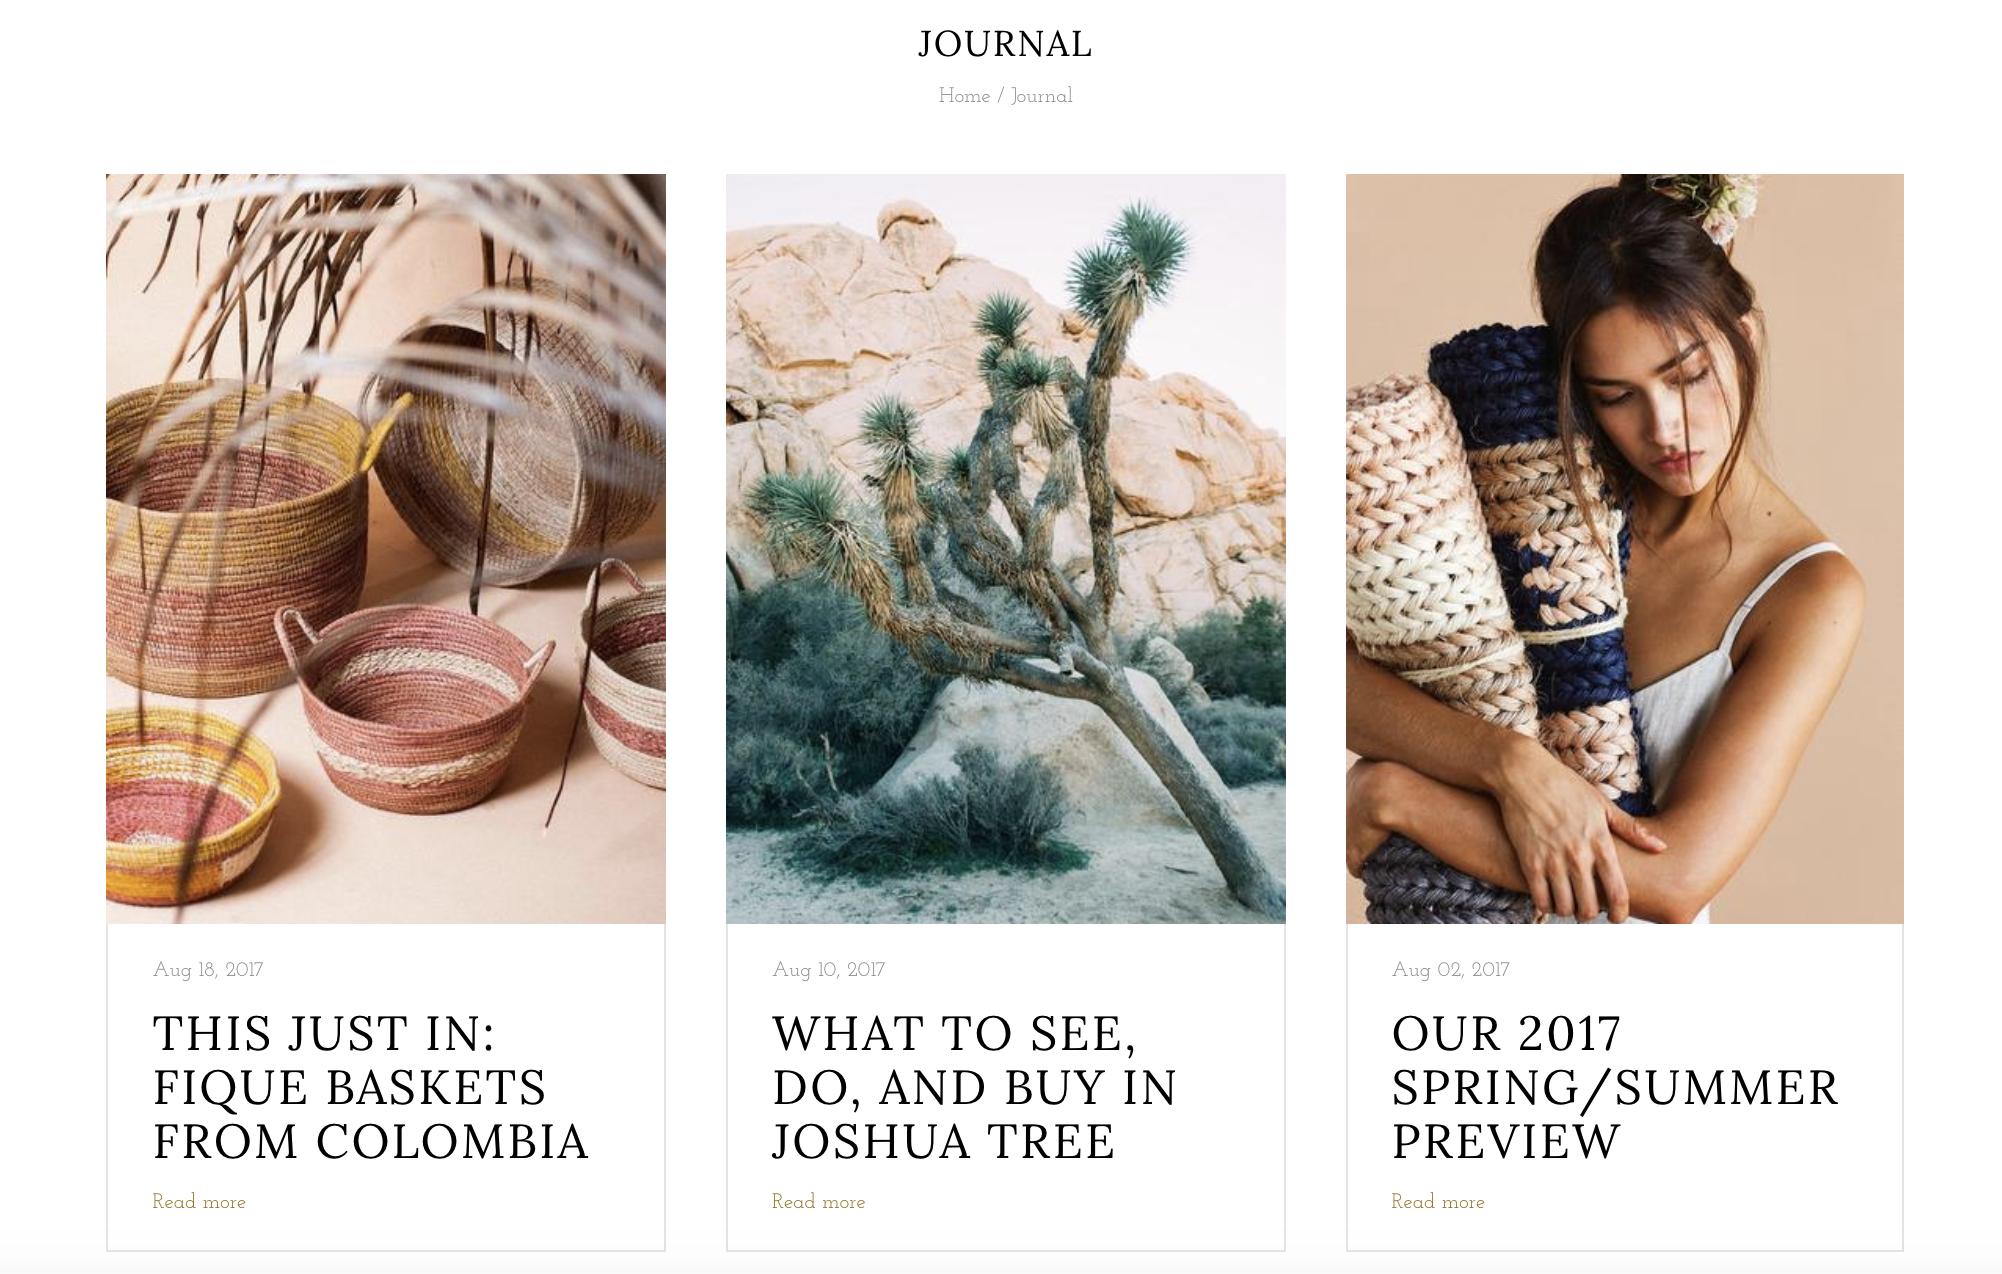 Blog page displaying 3 recent blog posts